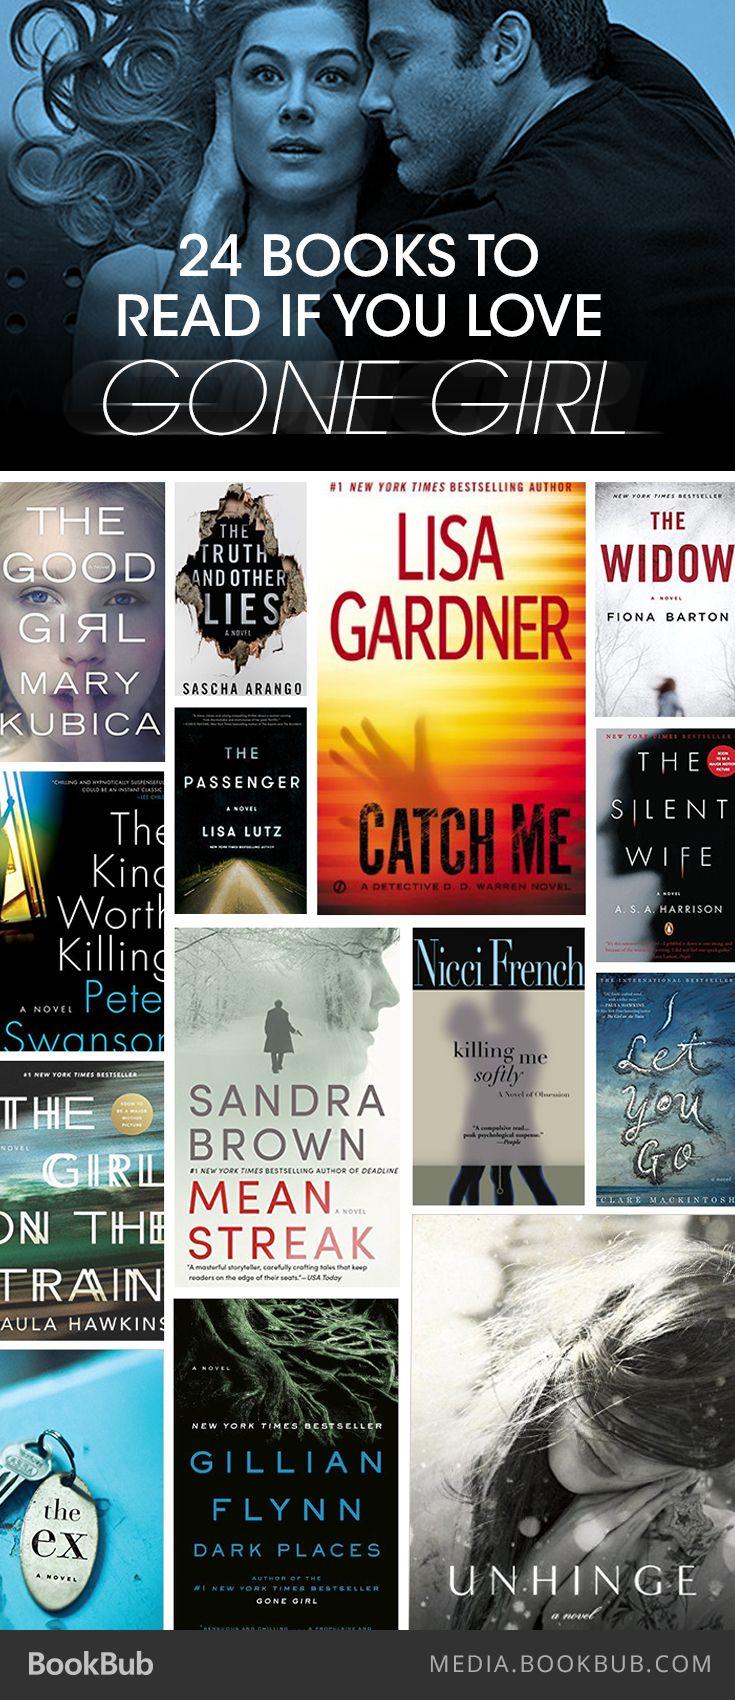 24 Must-Read Books If You Love 'Gone Girl'Suzi Bryant